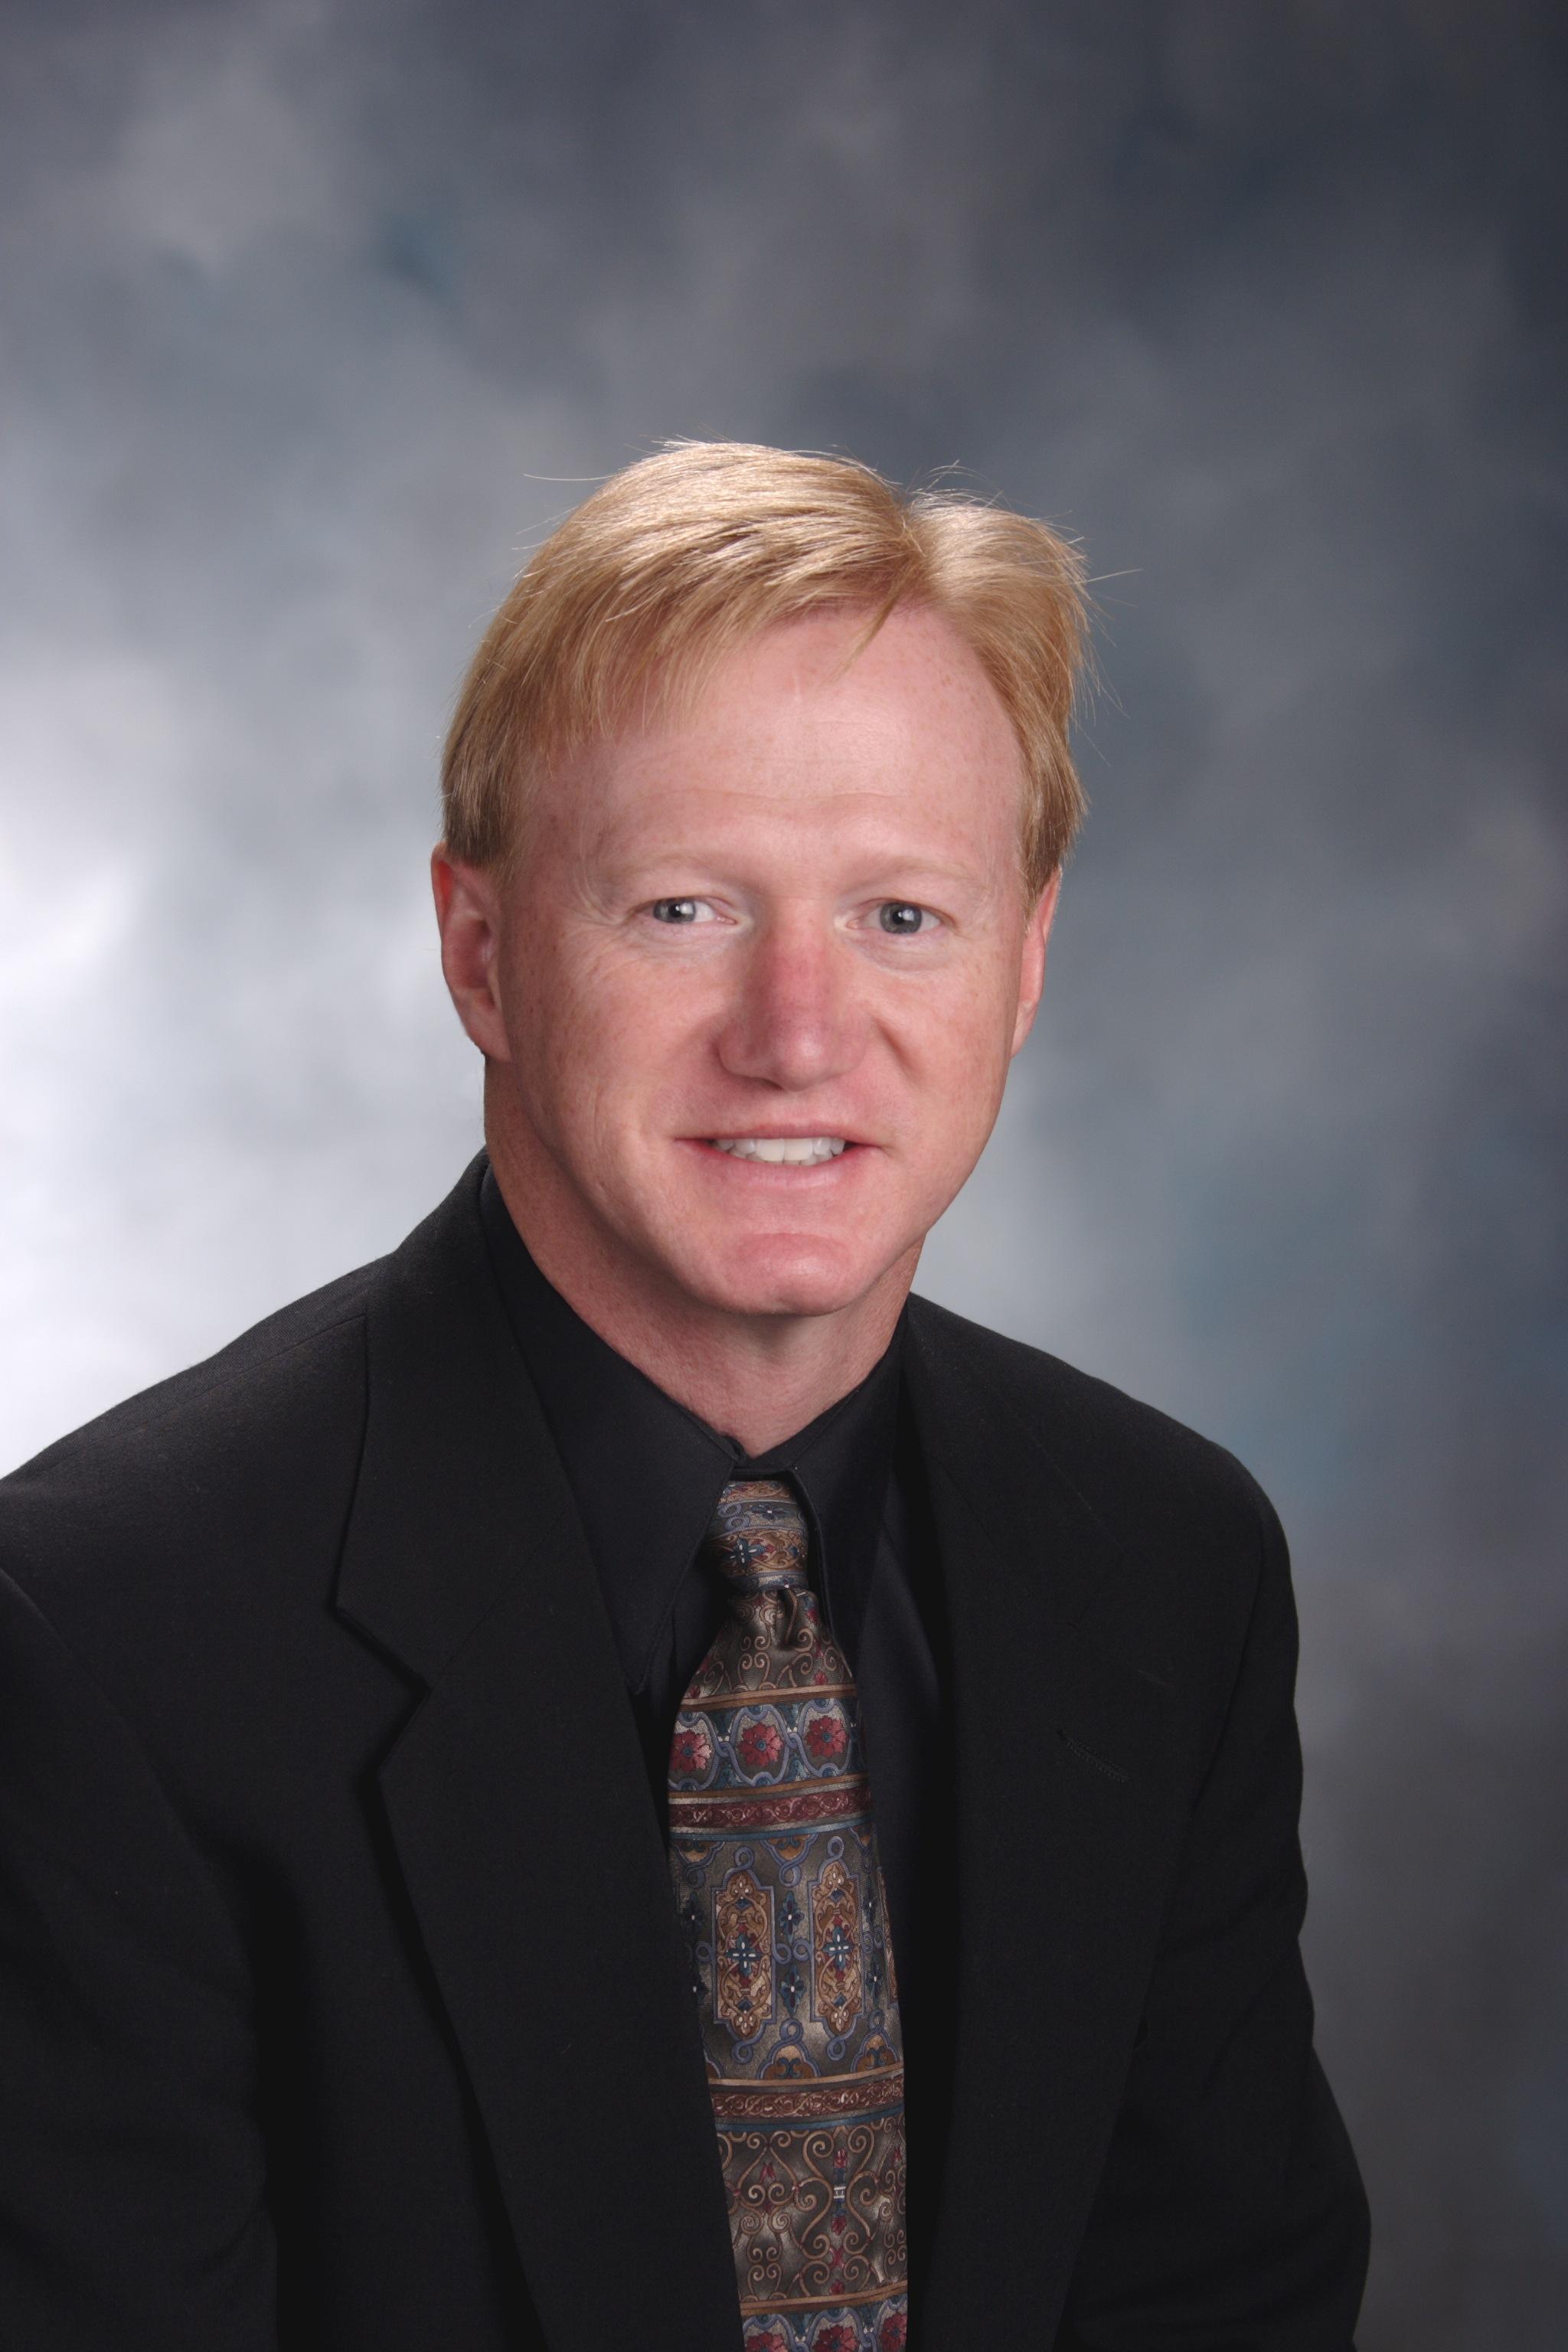 Dr. Randy Fitch, DACVS